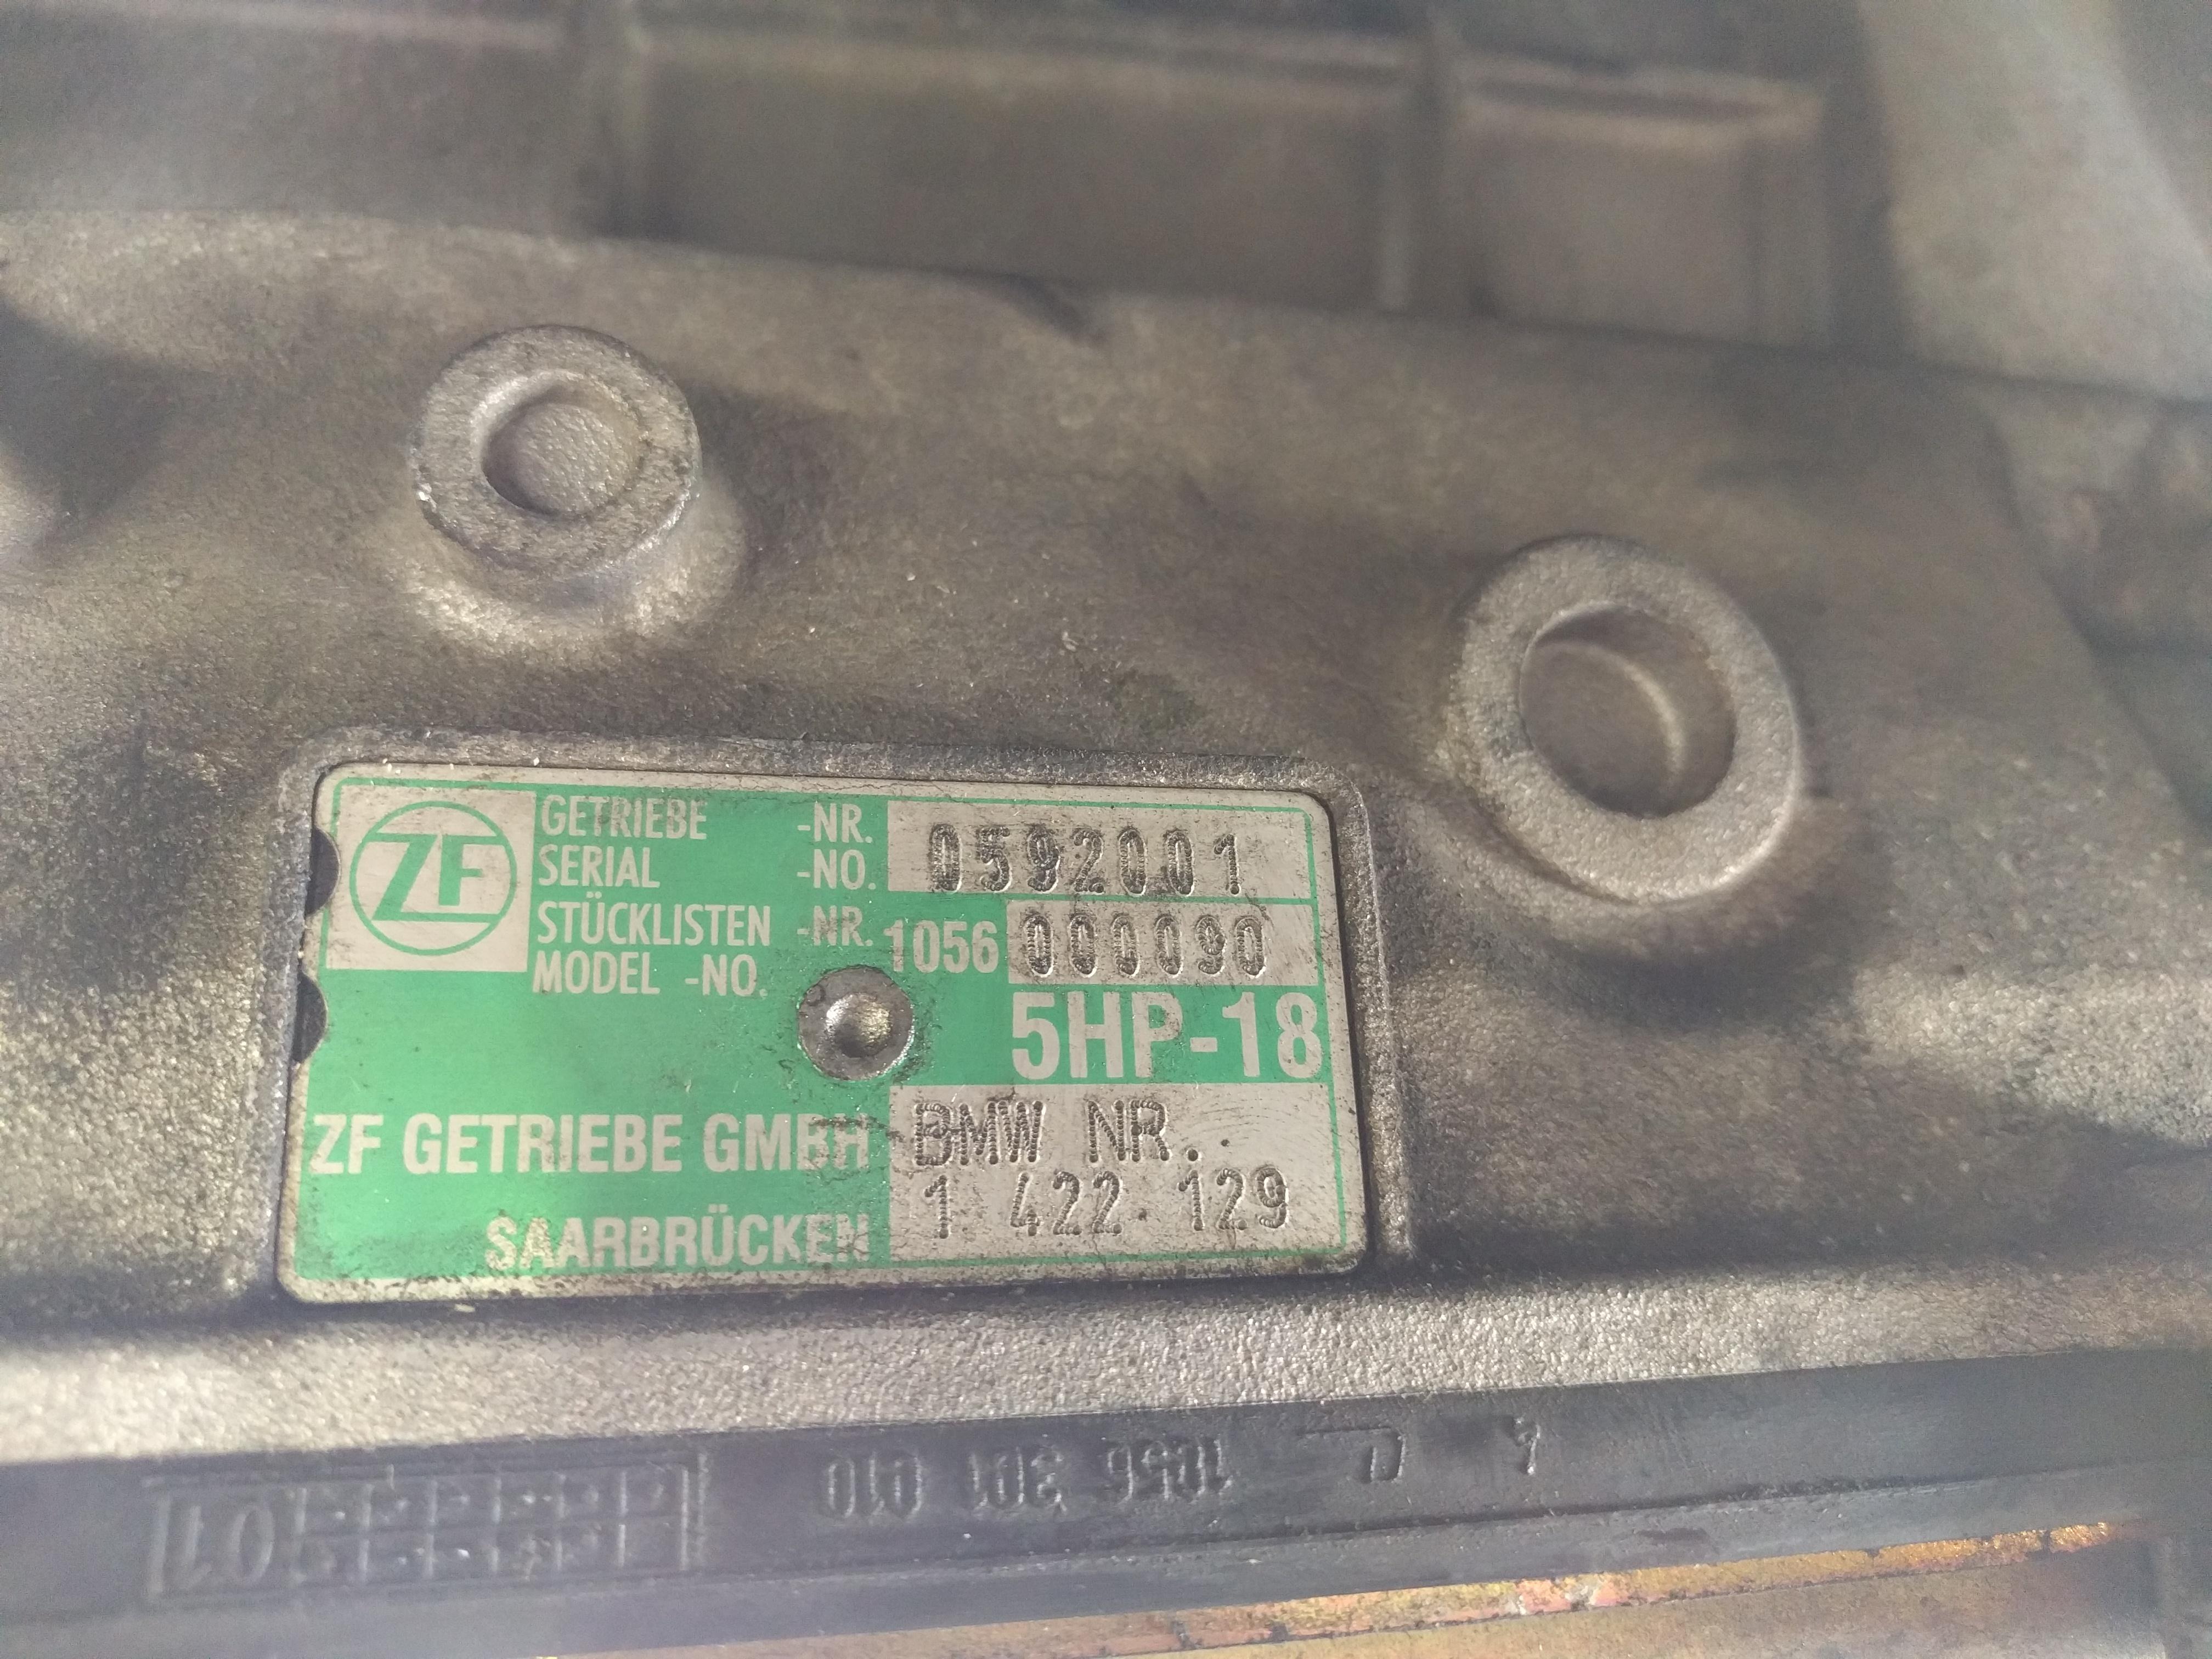 E34 Auto Transmission Fitment Issues Maintenance Bmw Tcu Wiring Diagram Img 20180206 141610